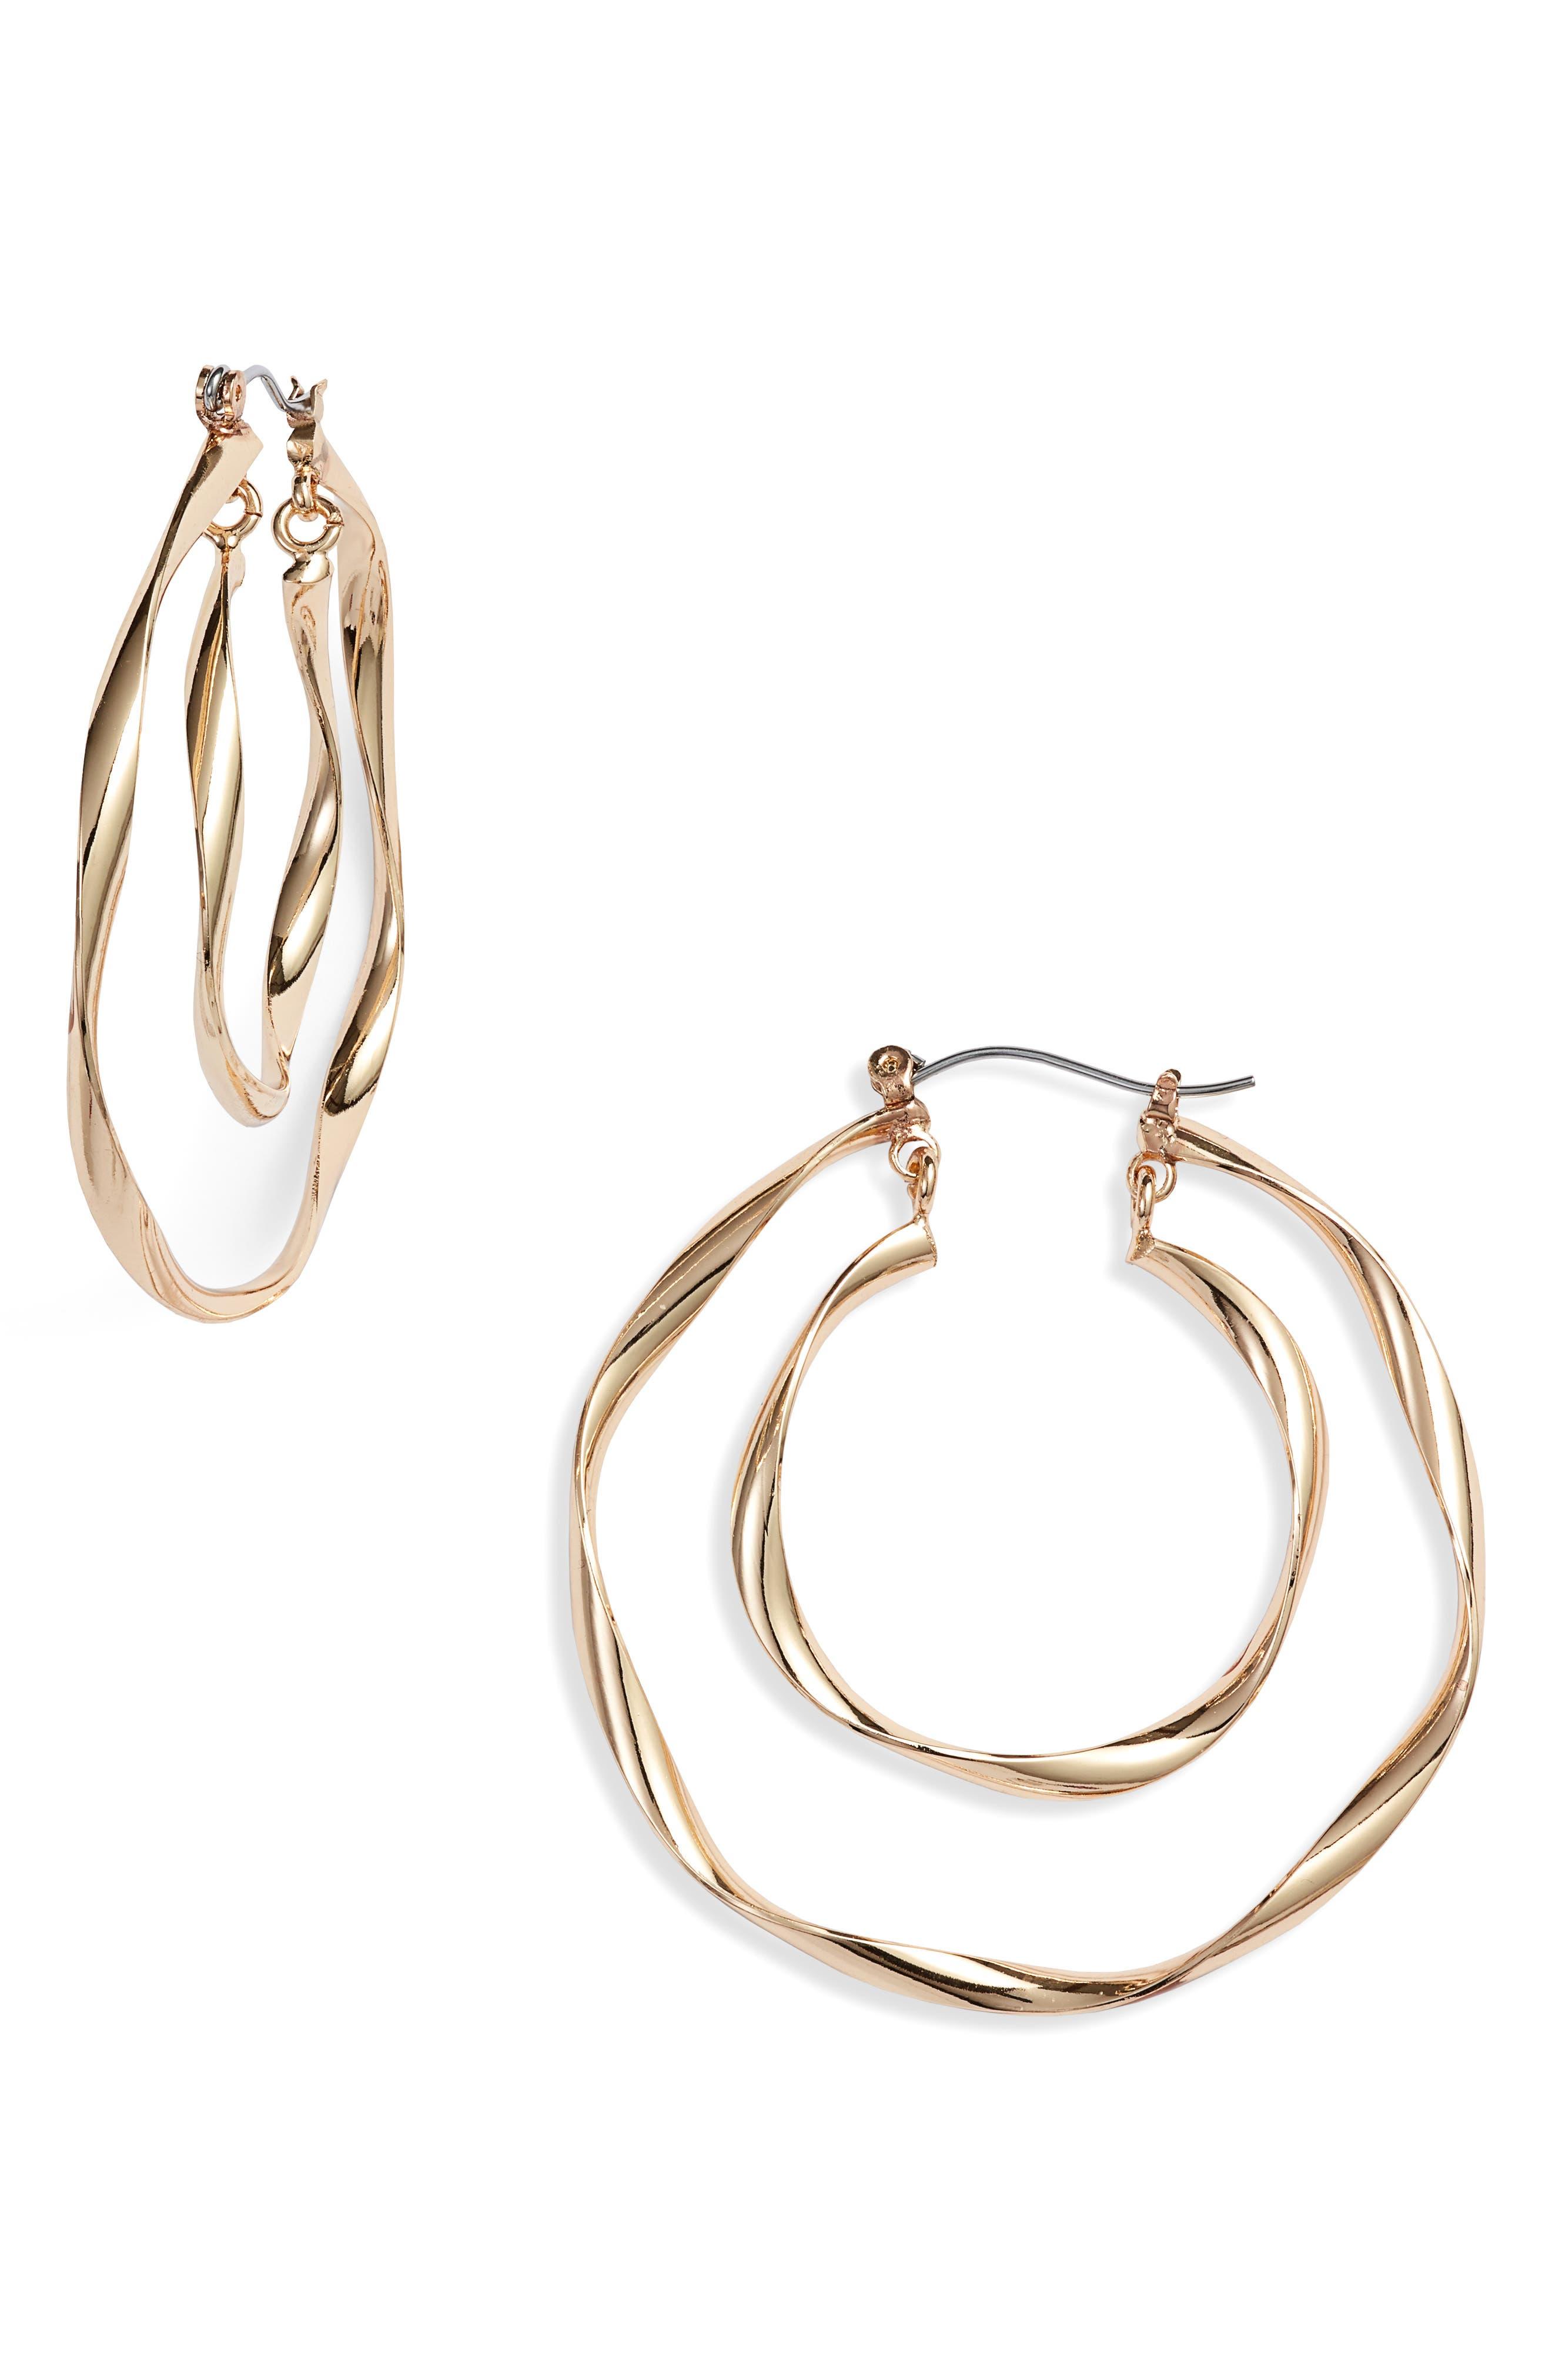 Twisted Double Hoop Earrings